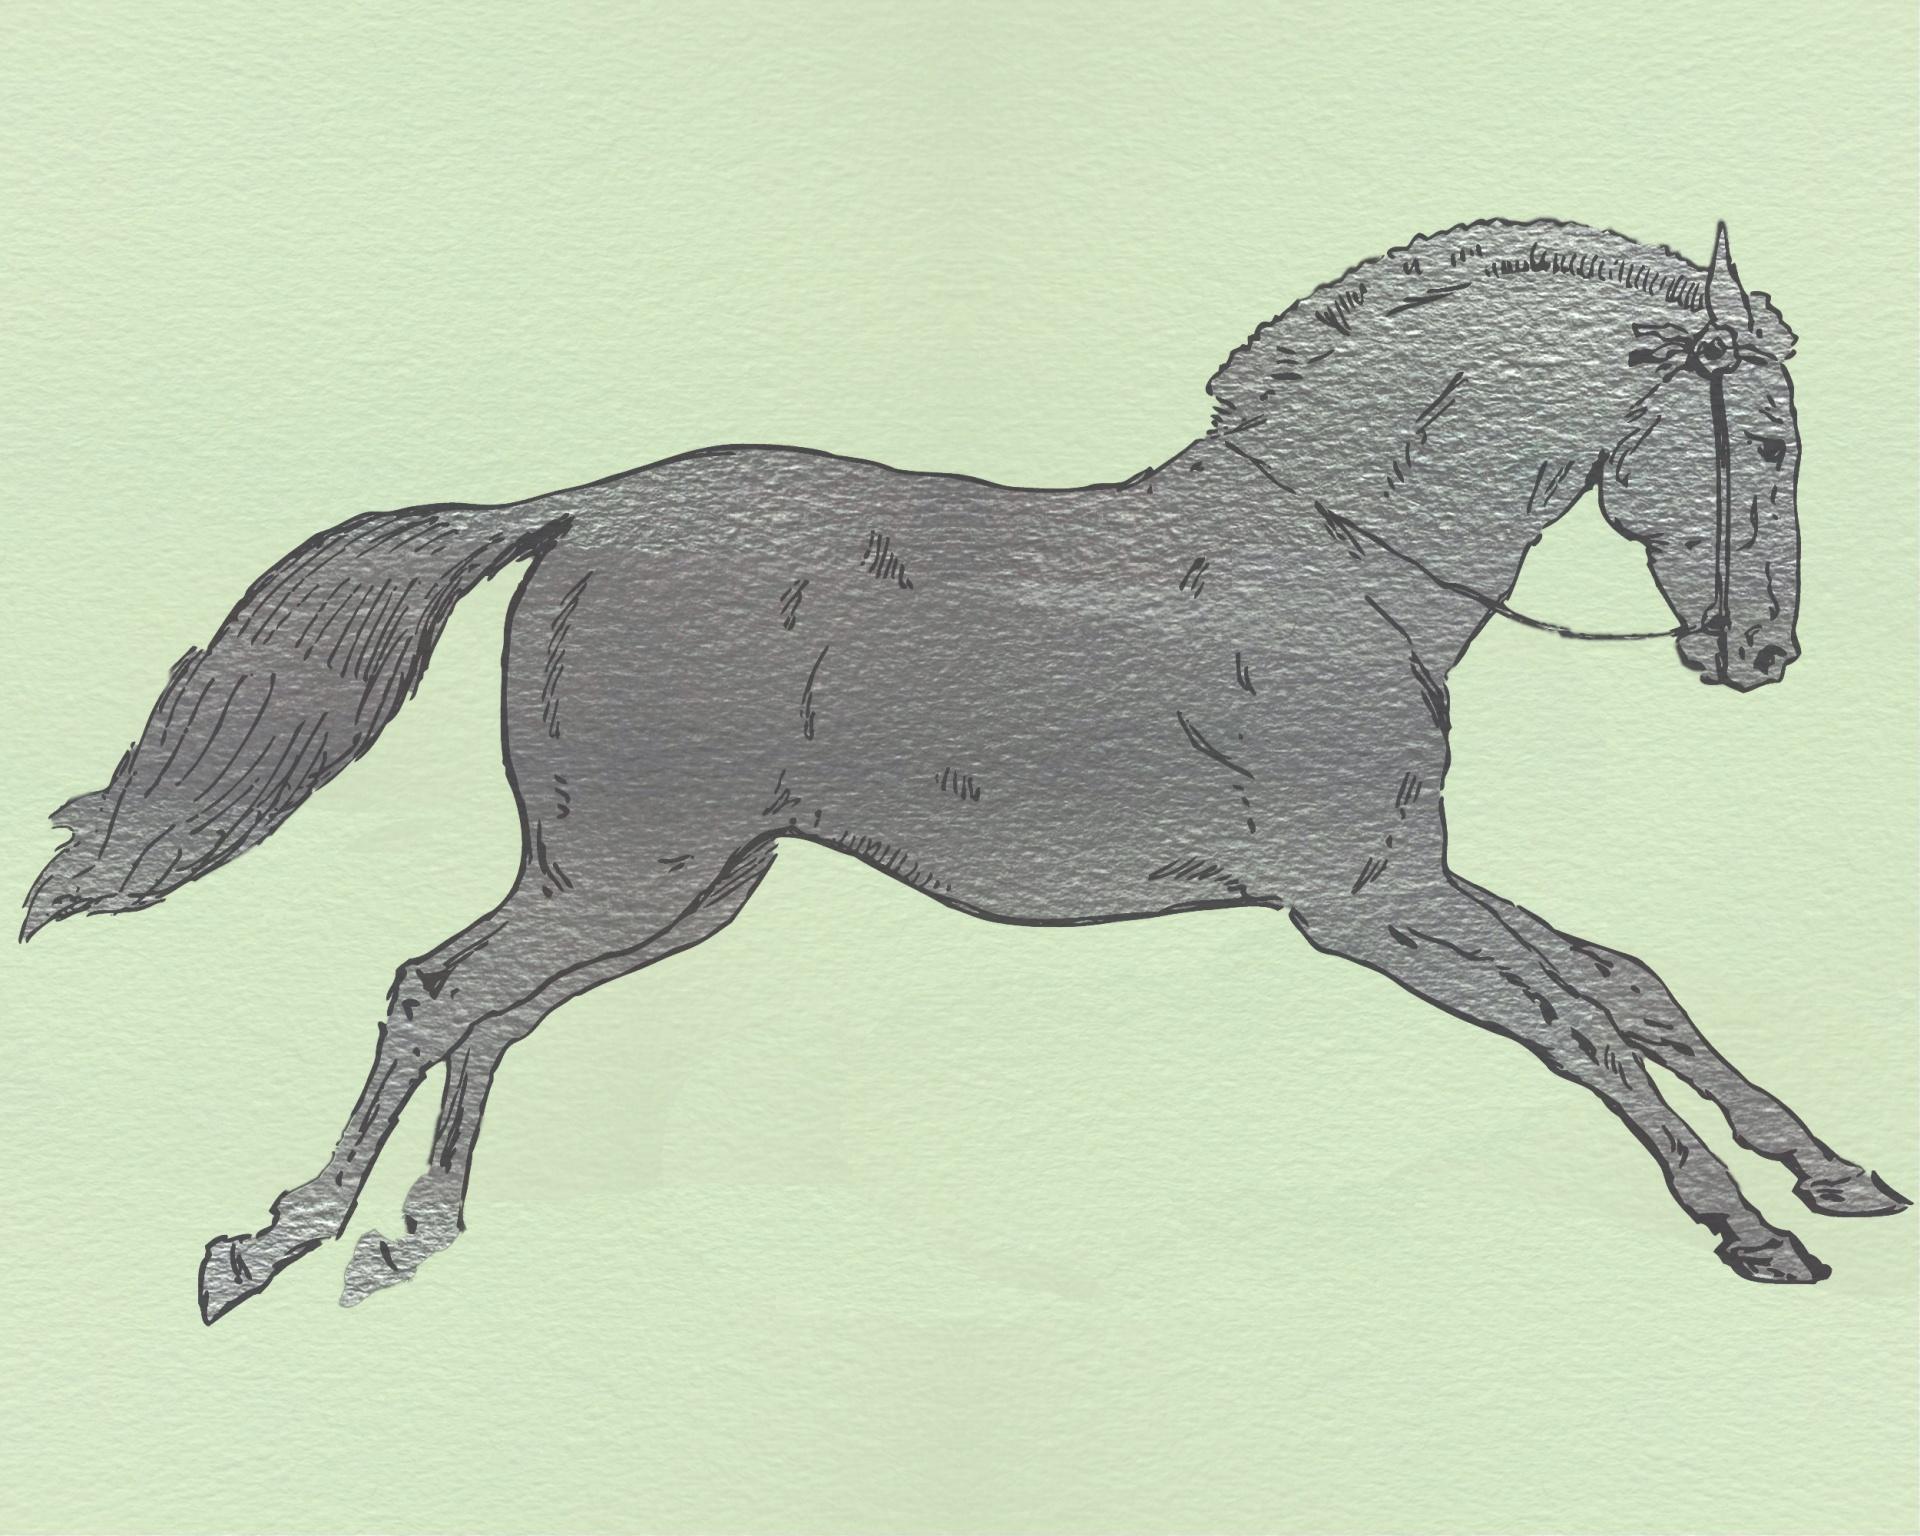 Horse Illustration Free Stock Photo - Public Domain Pictures